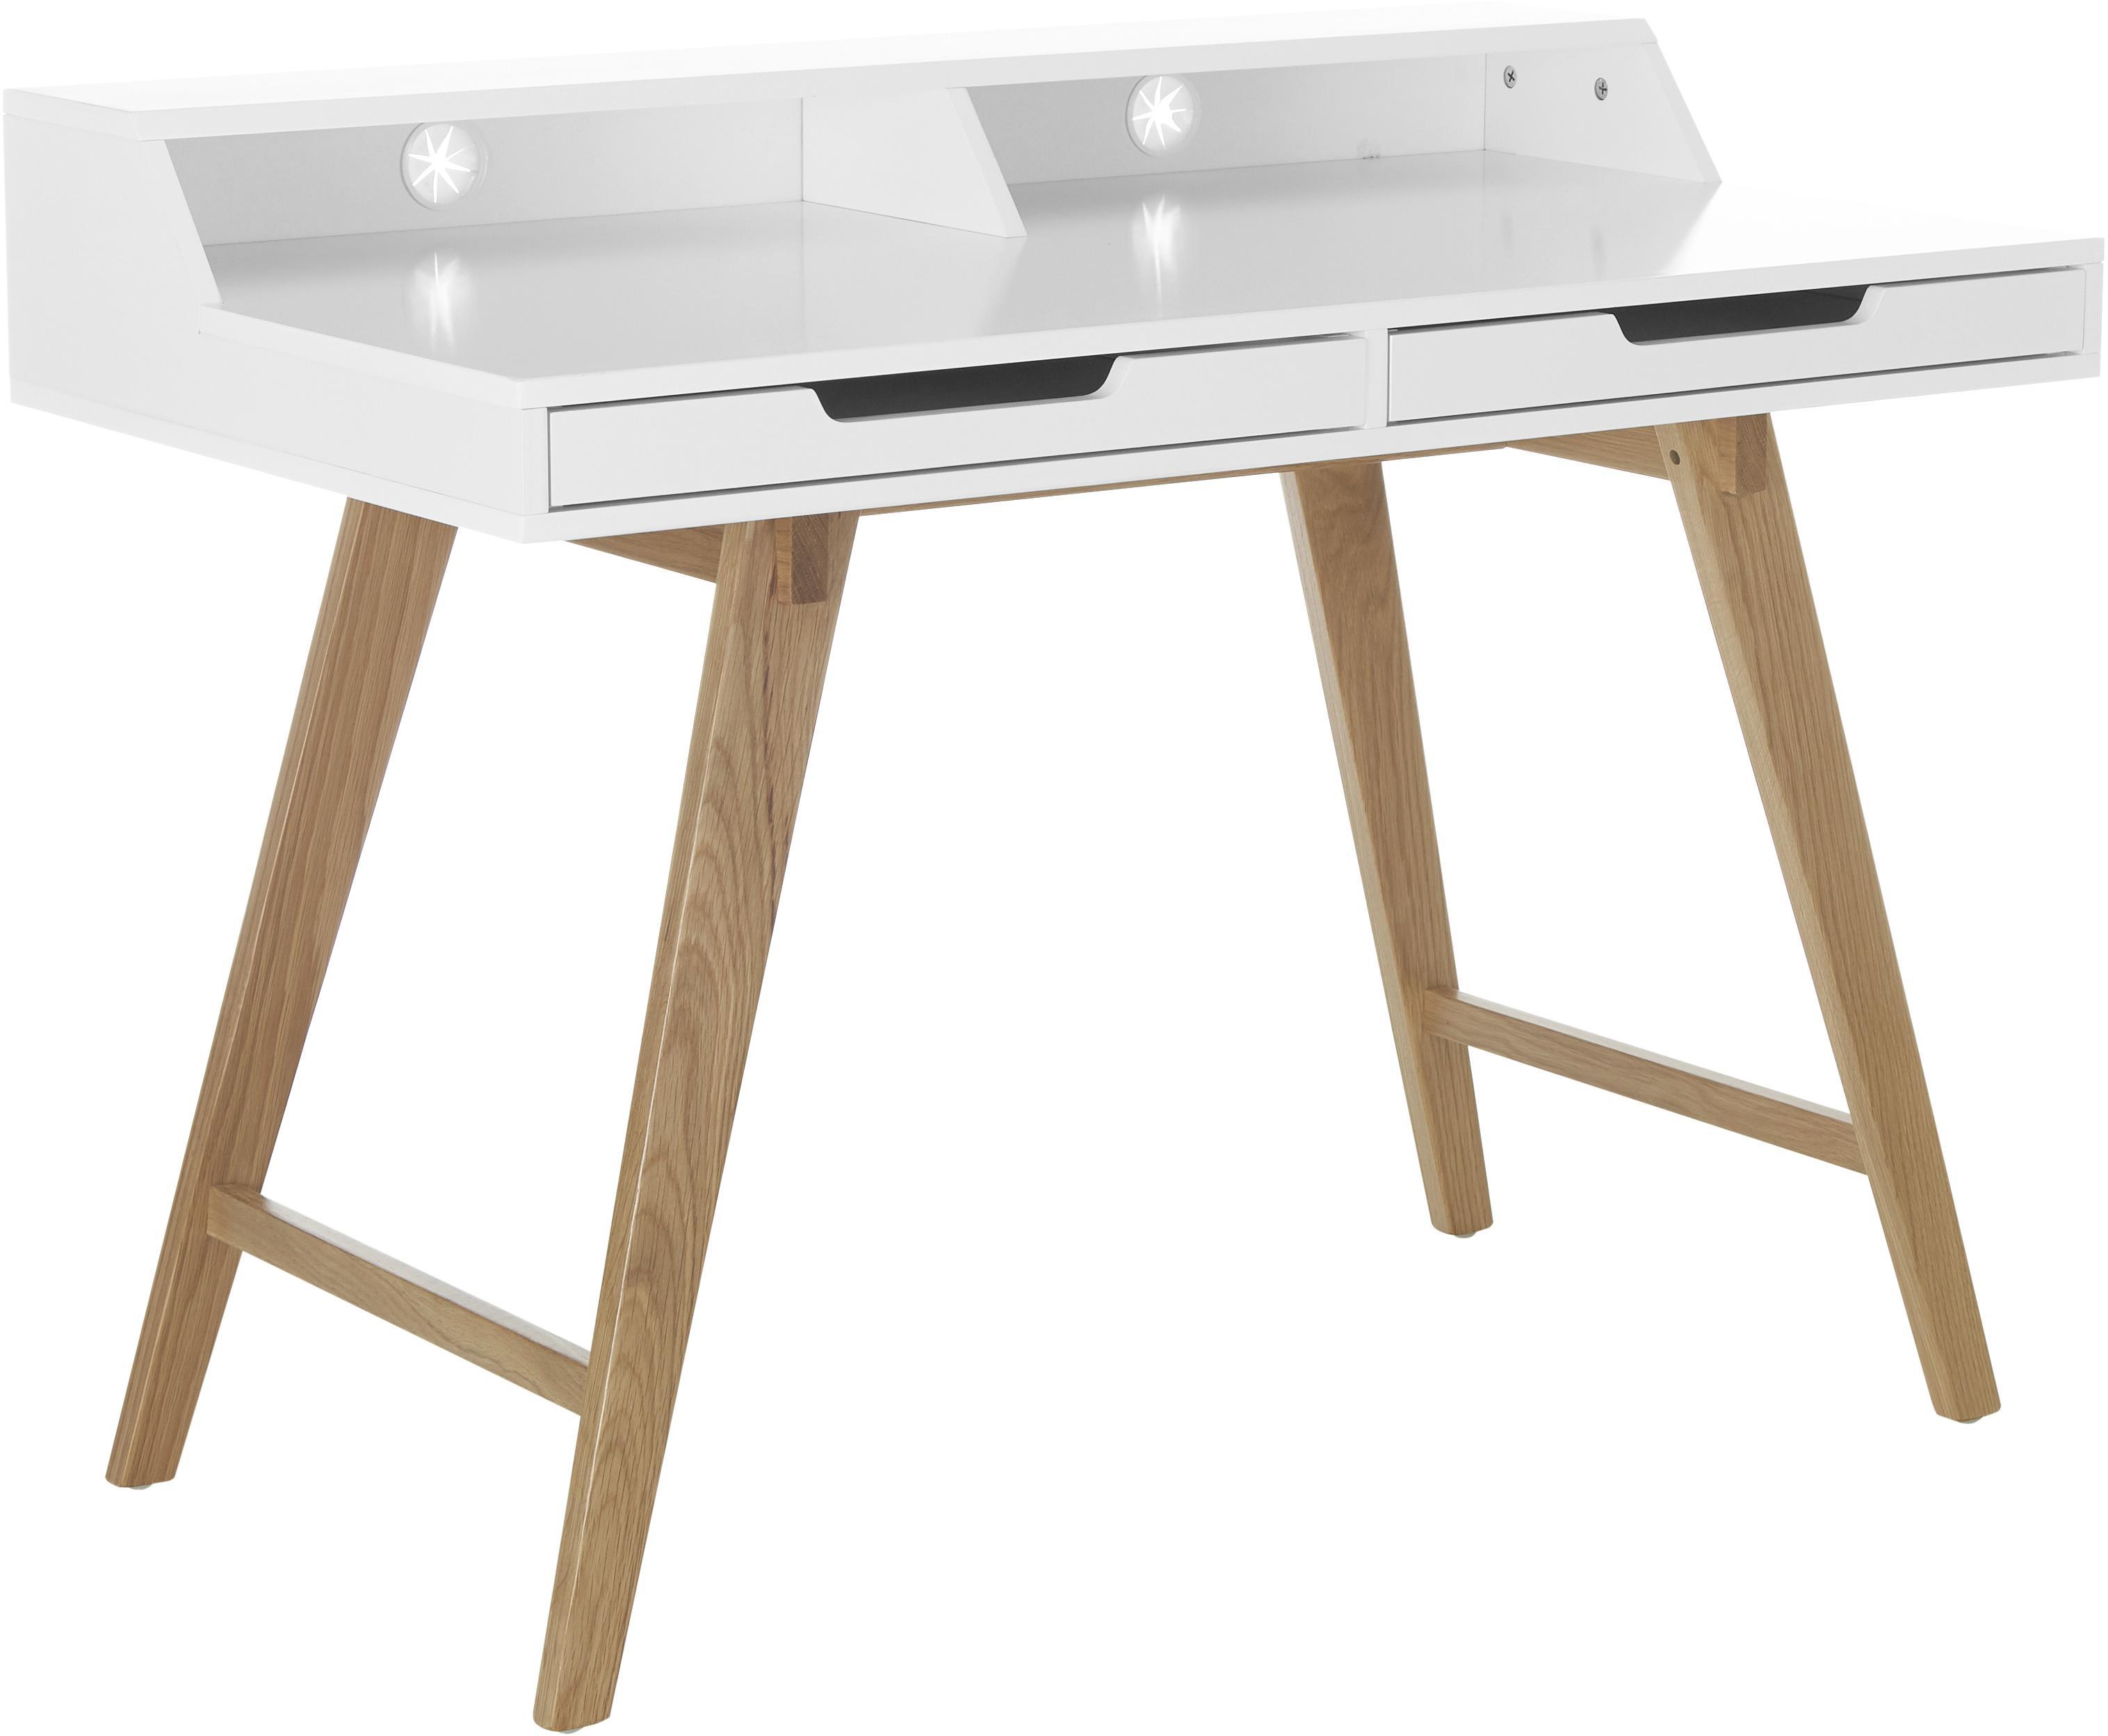 Escritorio de madera Skandi, Estructura: tablero de fibras de dens, Patas: madera de roble macizo, Blanco, roble, An 110 x Al 85 cm